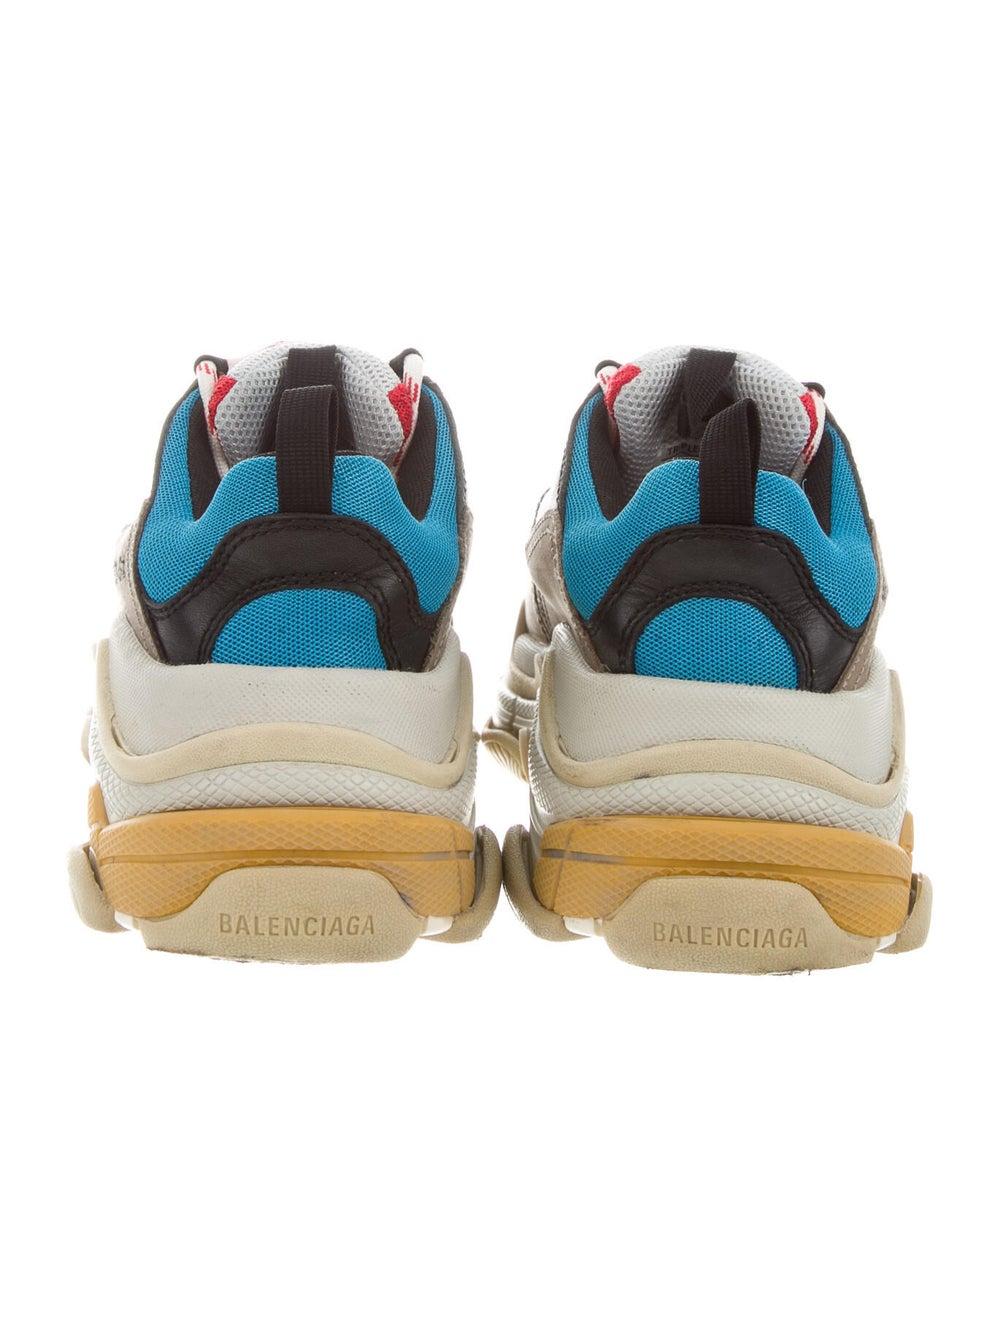 Balenciaga Colorblock Pattern Chunky Sneakers Grey - image 4